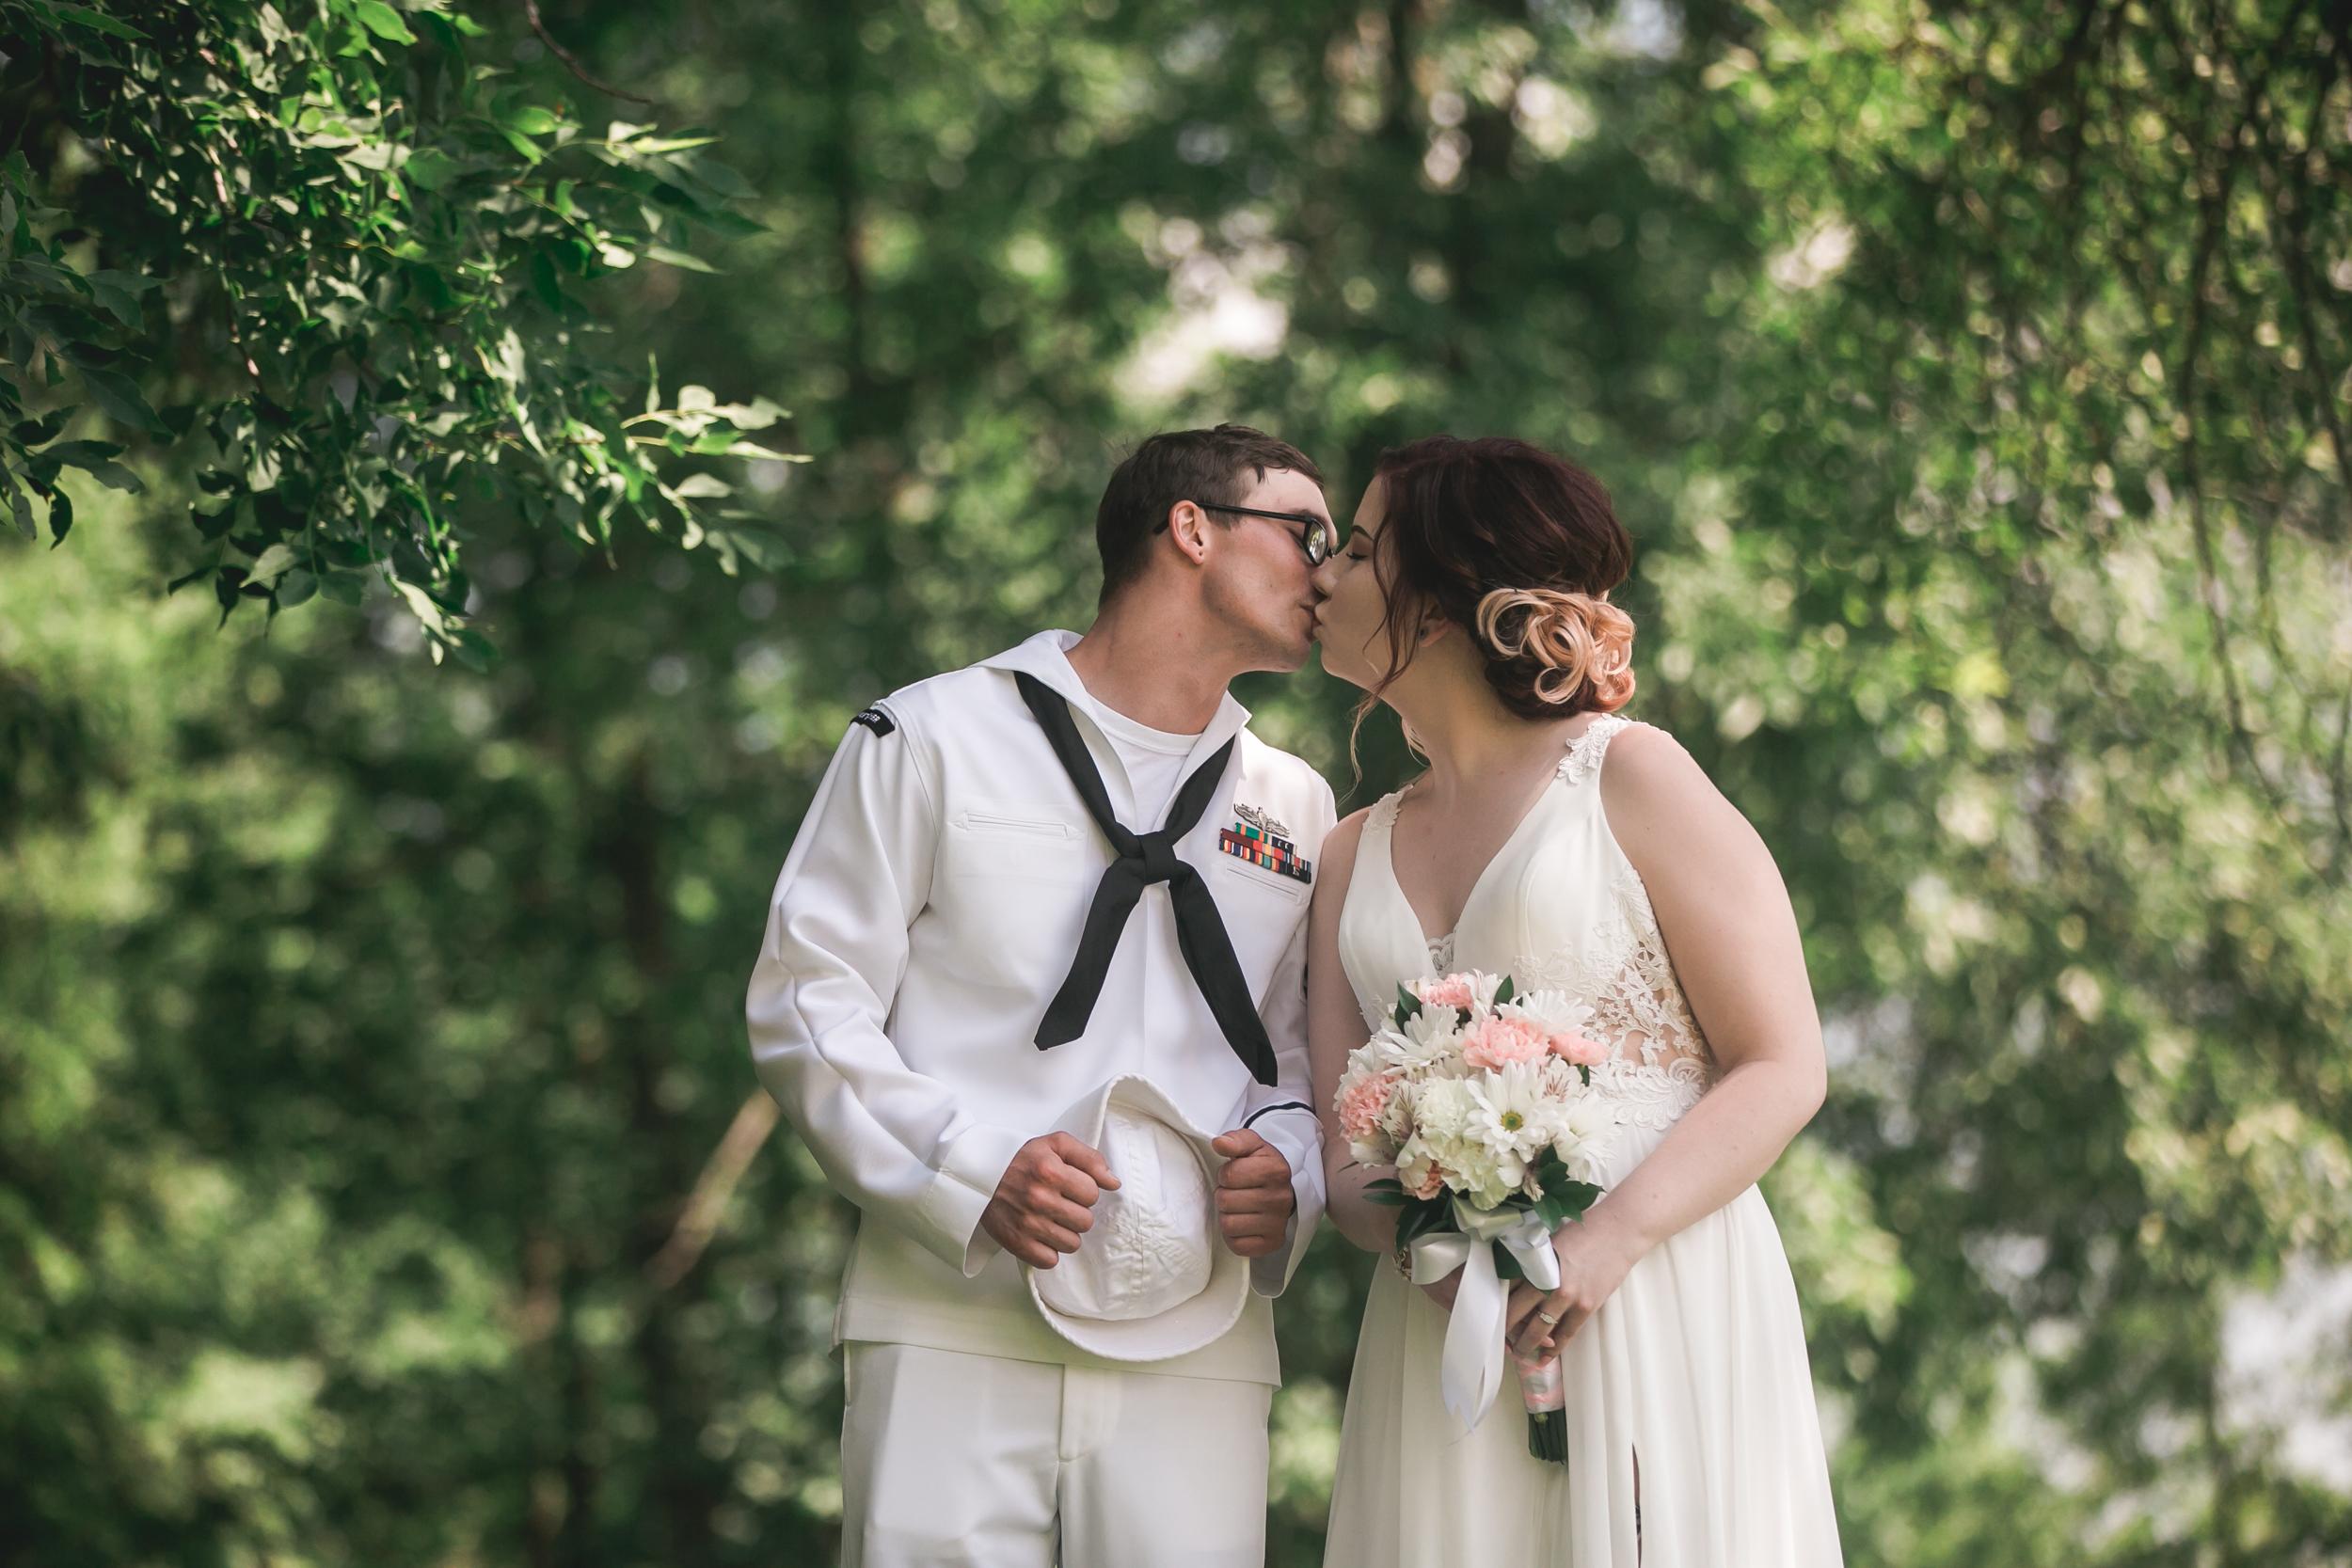 intimate elopement wedding, duluth mn, duluth mn elopement wedding, -www.rachelsmak.com22.jpg